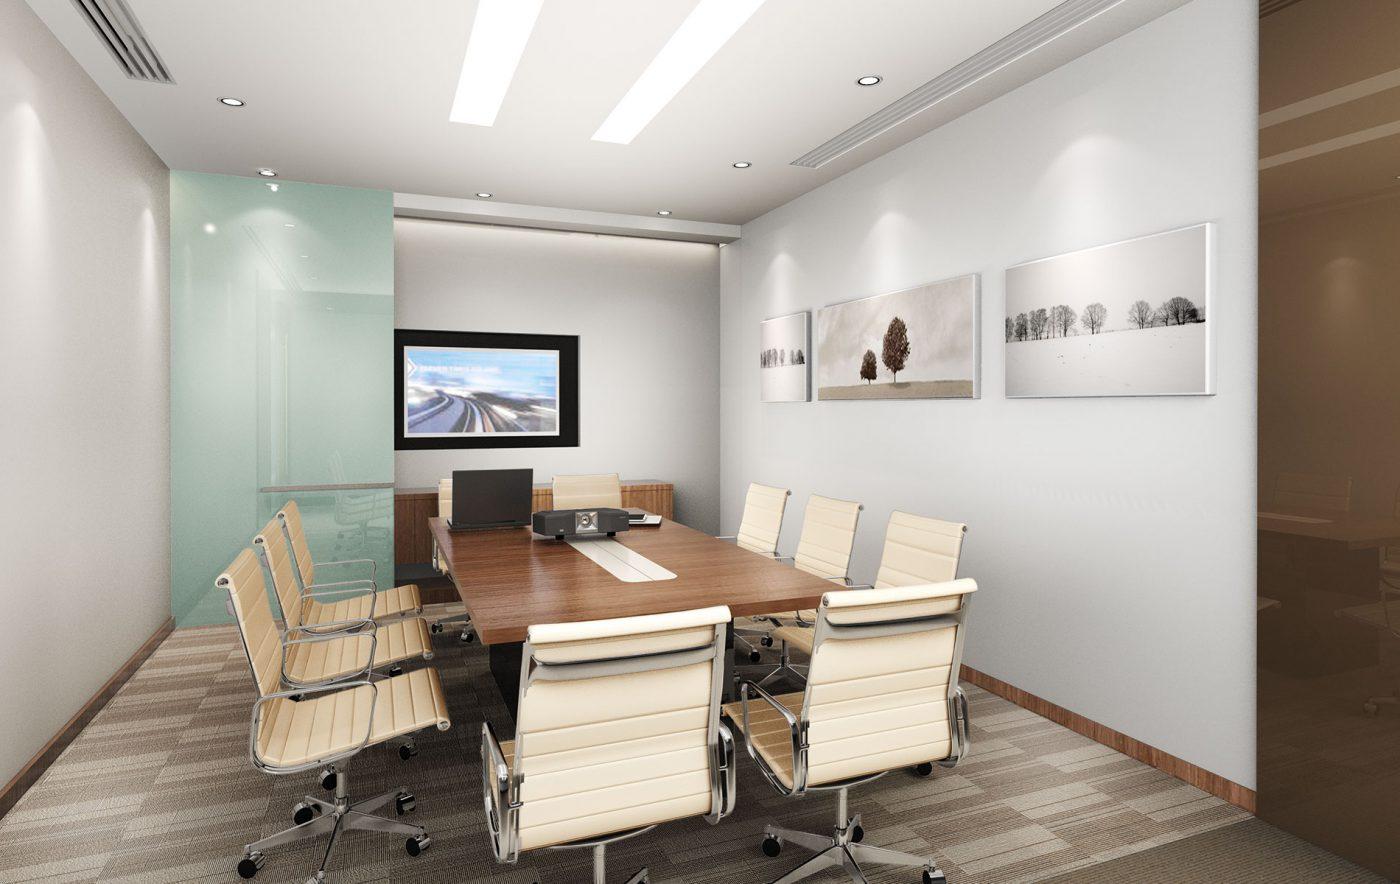 guotai mcx interior. Black Bedroom Furniture Sets. Home Design Ideas